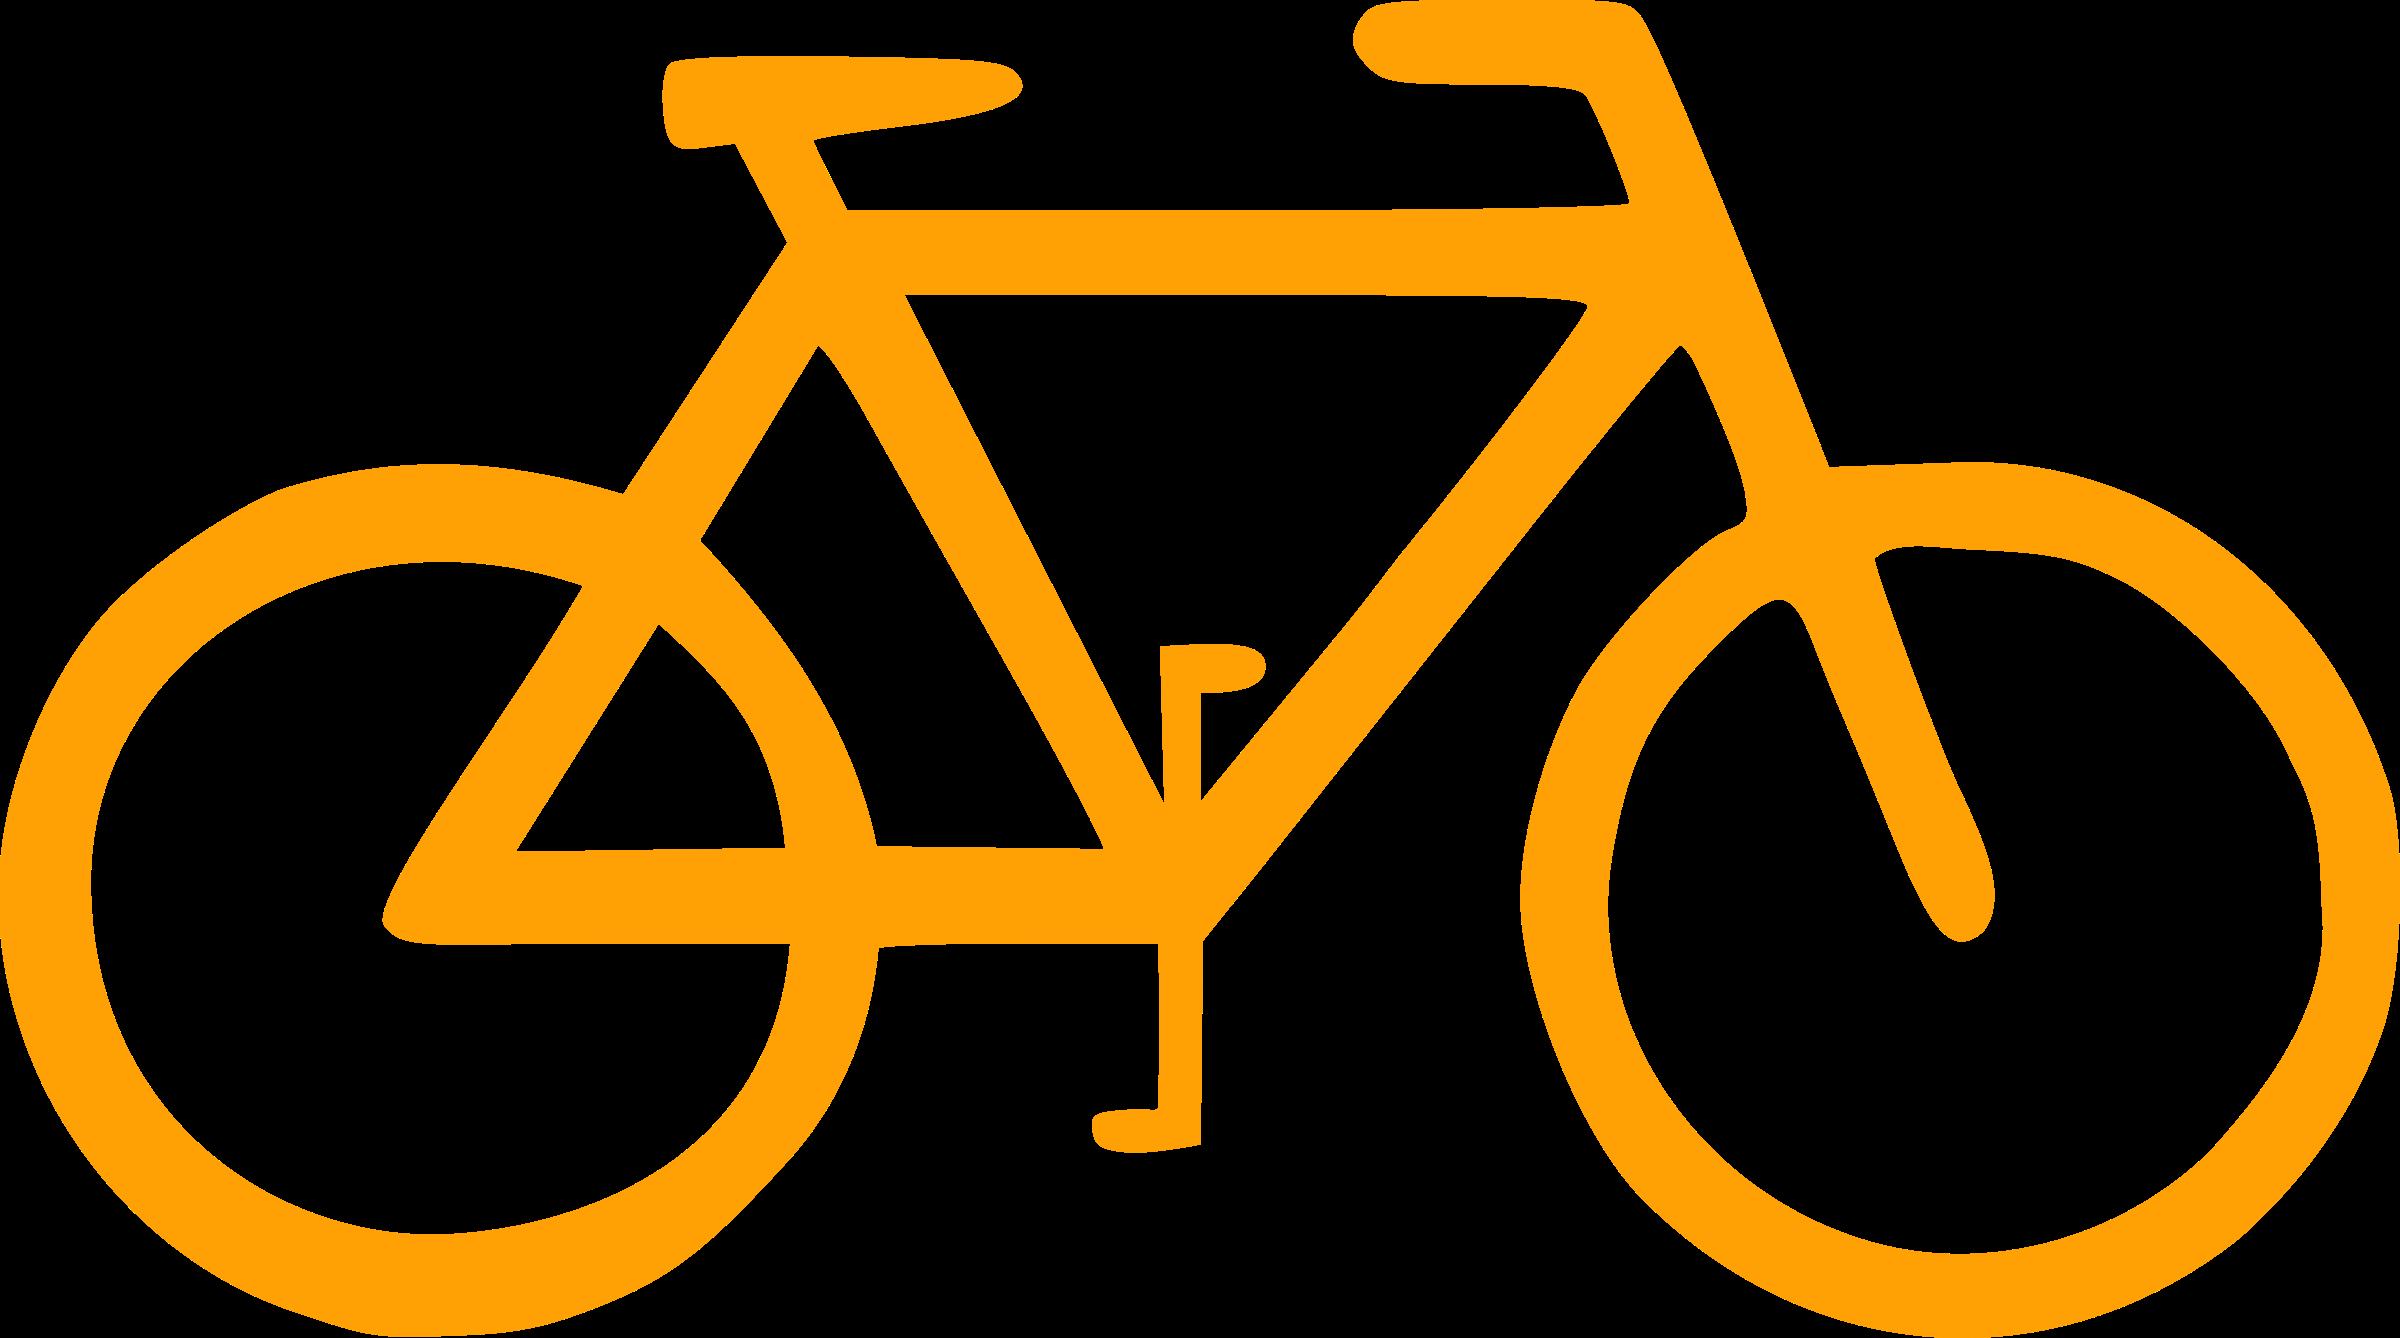 Bike clipart sign. Bicycle symbol big image